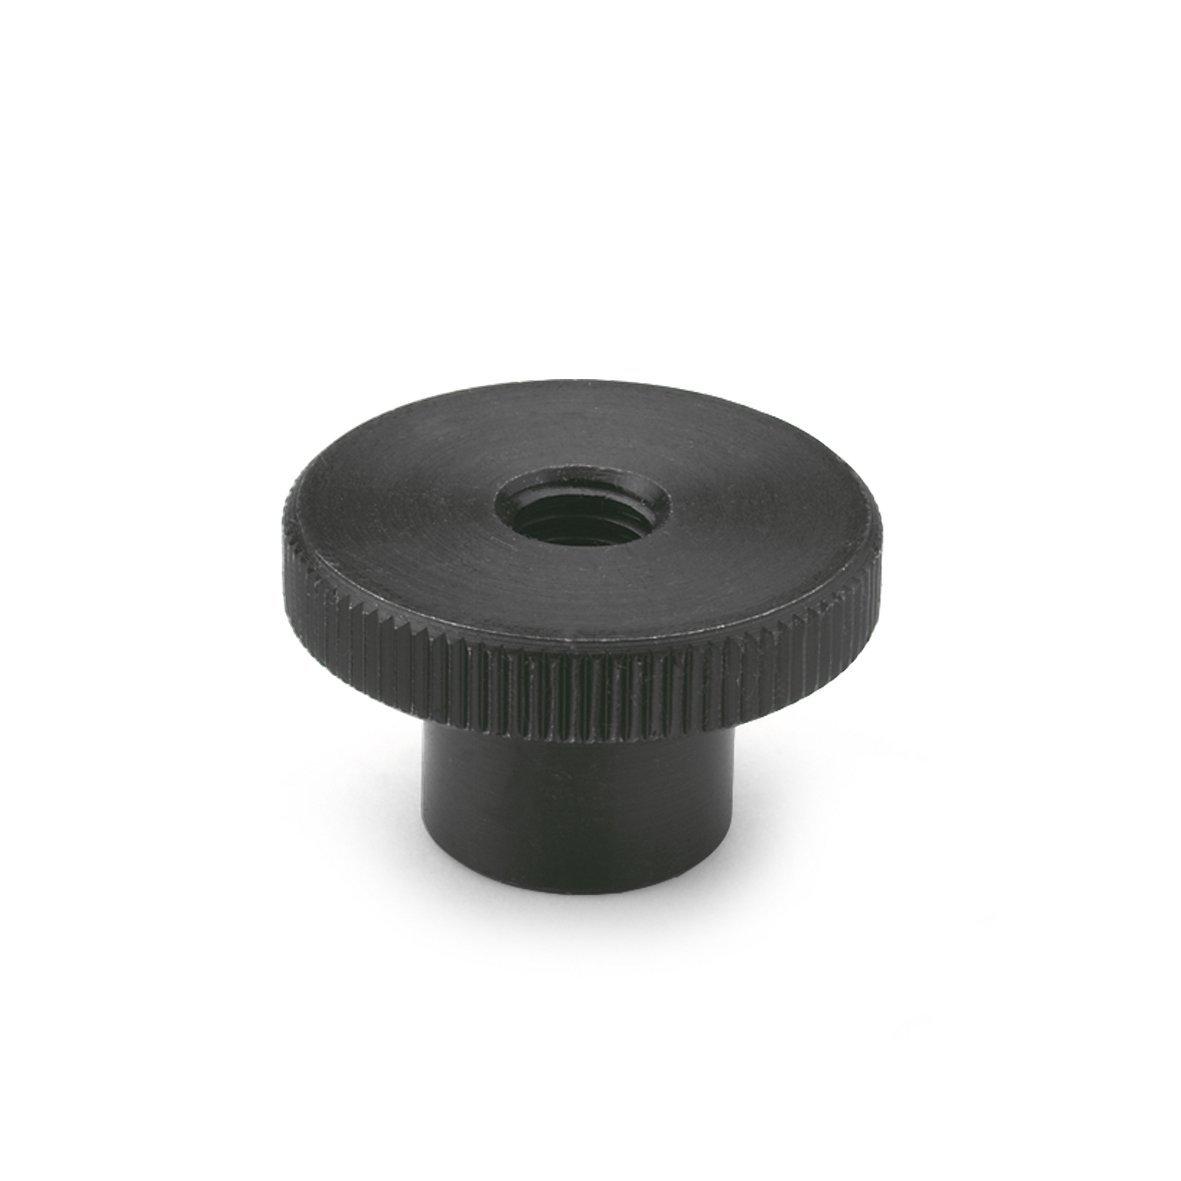 Ganter Normelemente | Hohe Rä ndelmutter - DIN 466-M5 | Stahl brü niert | 20 Stü ck